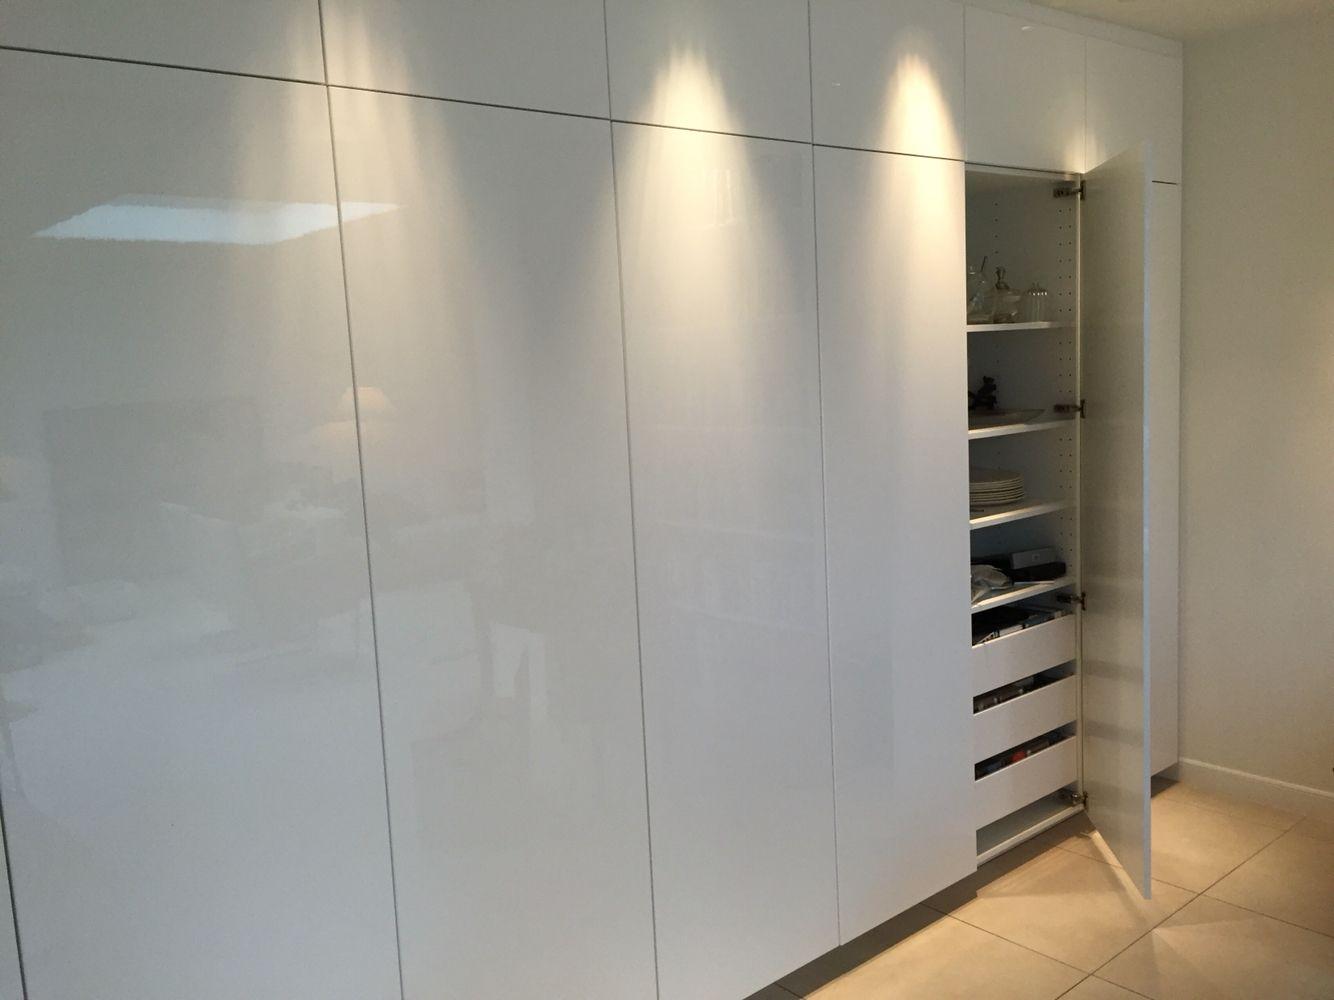 Kastenwand hoogglans wit IKEA keuken  Keukens